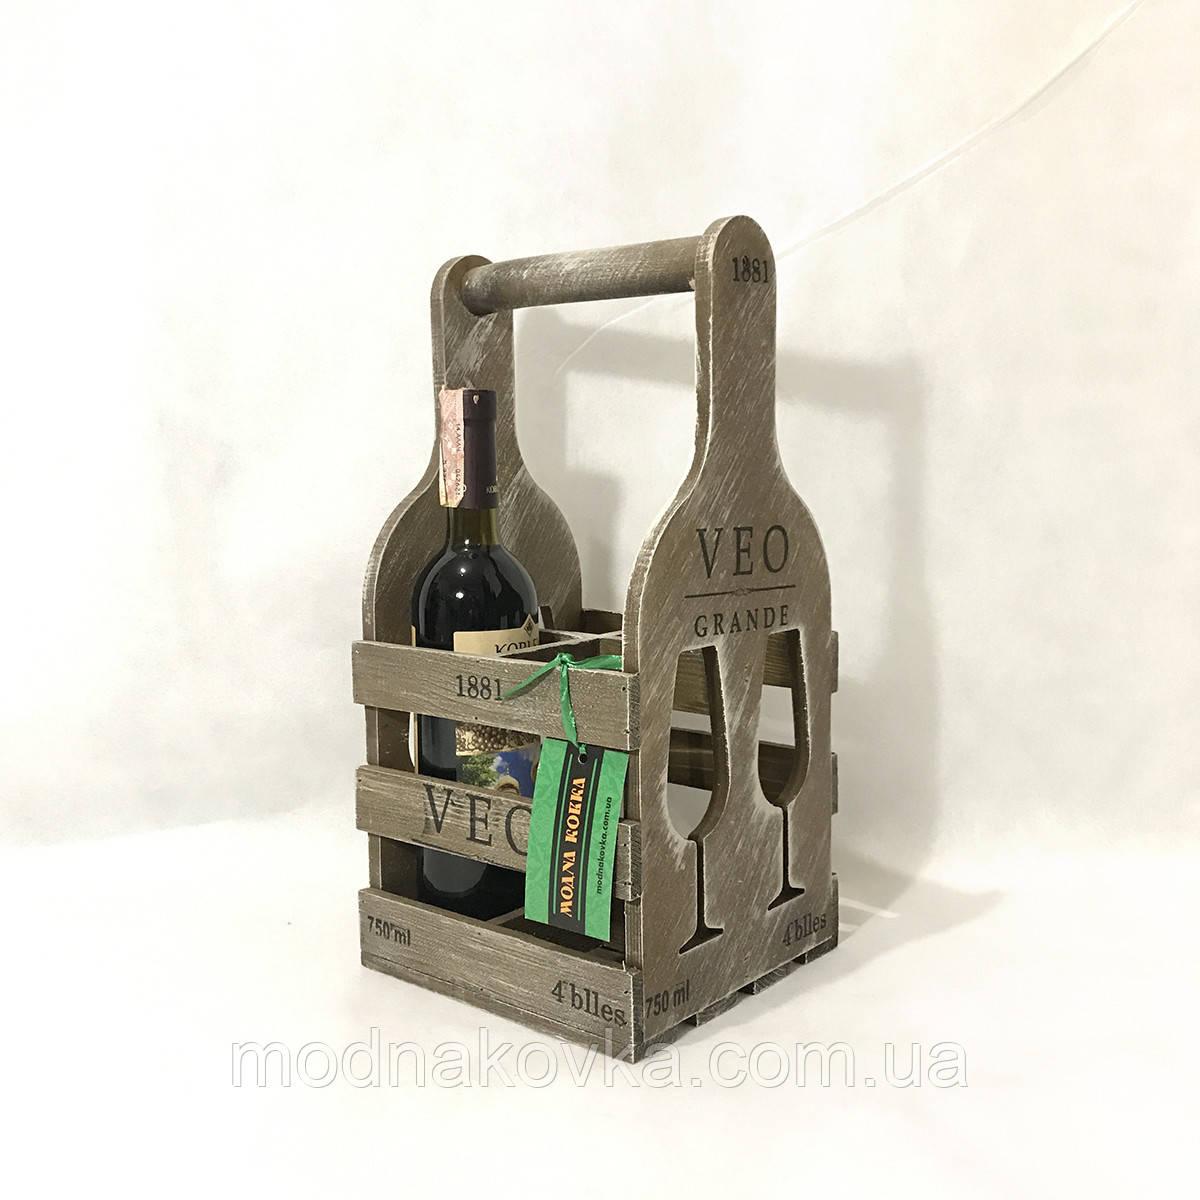 Подставка под бутылки І Деревянная подставка для вина Бокал 4 коричнево-белая І Оригинальные подарки